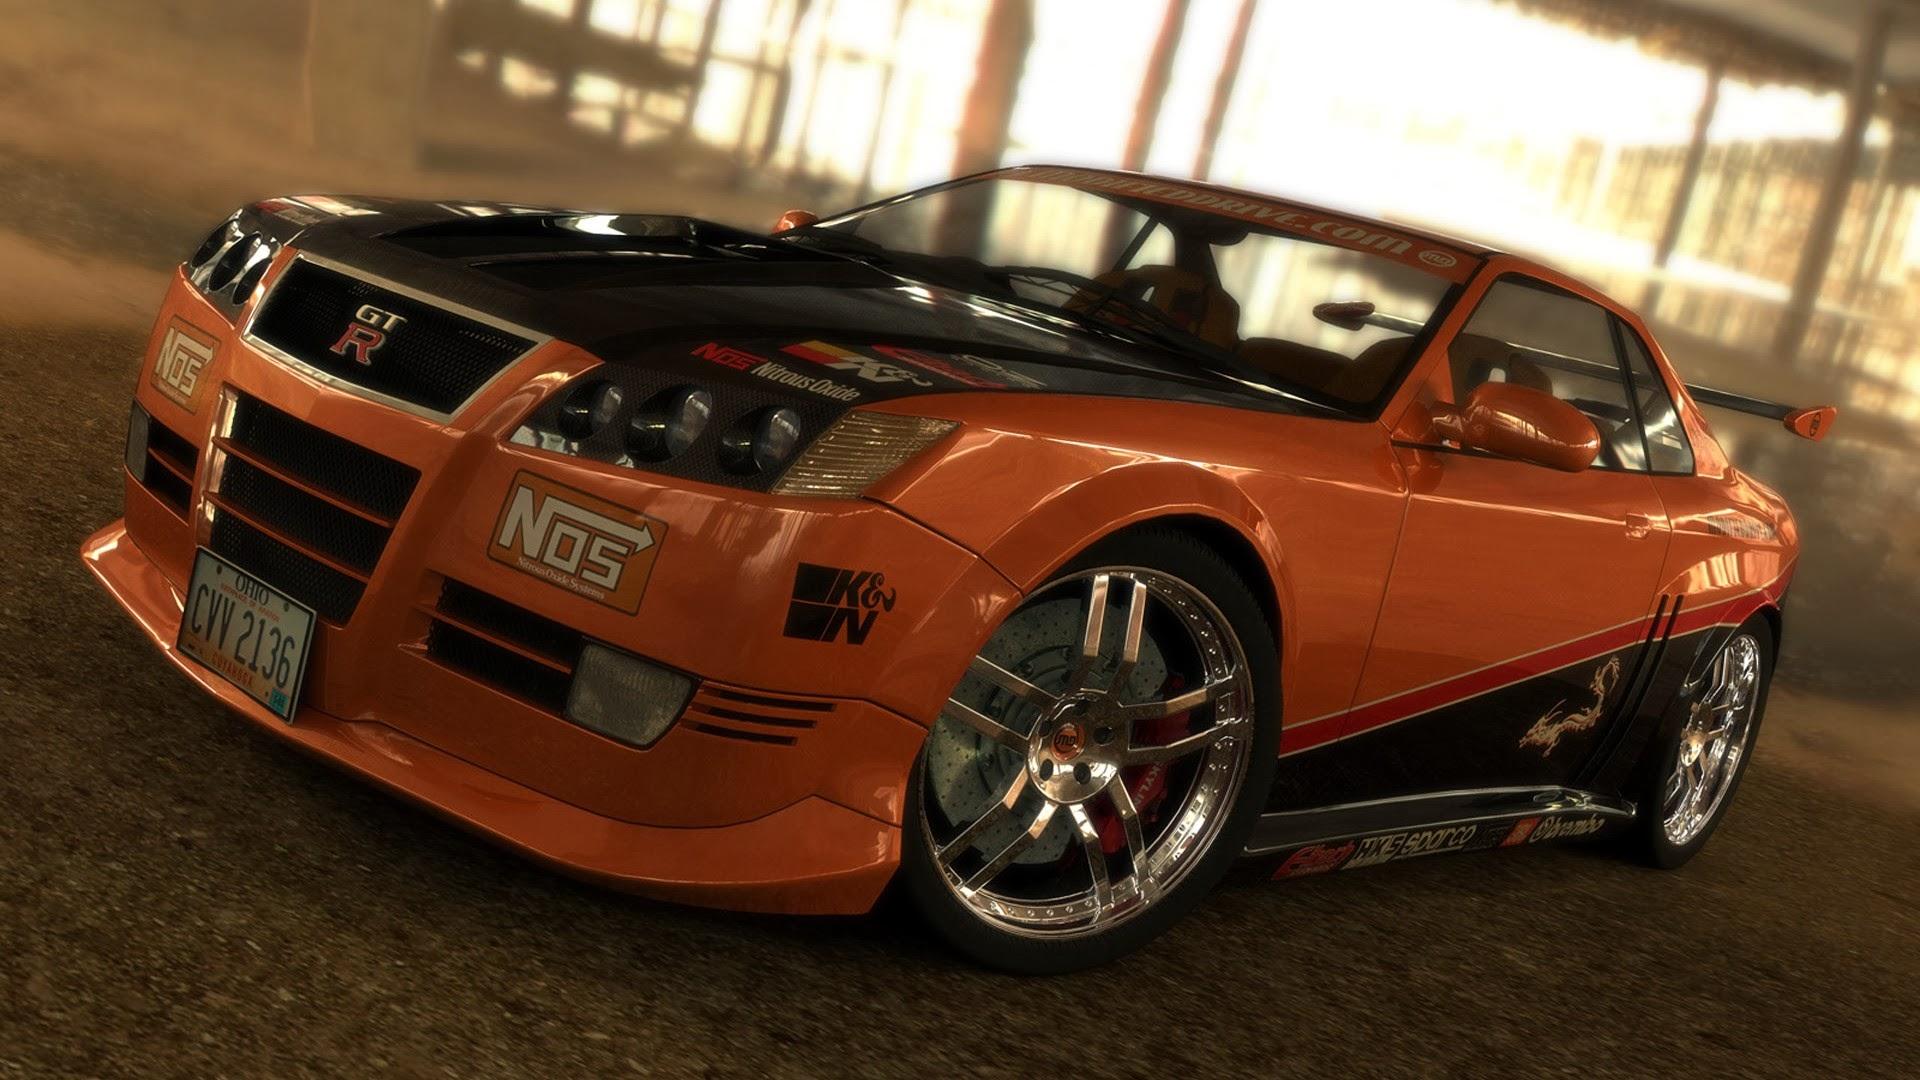 Autos Tuning Hd: Deportivos Nissan Tuning